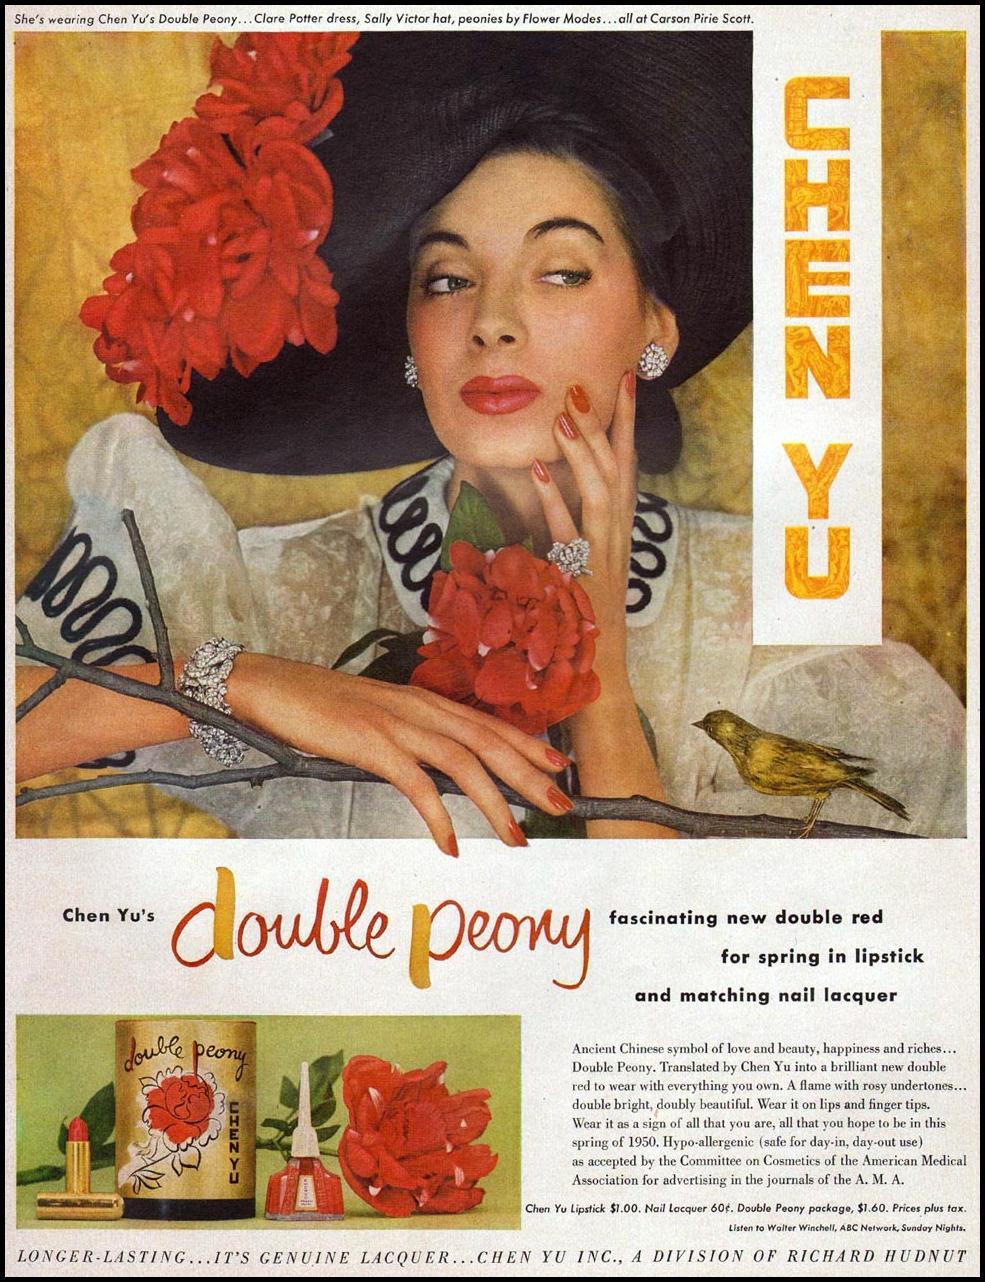 CHEN YU DOUBLE PEONY COSMETICS LIFE 04/17/1950